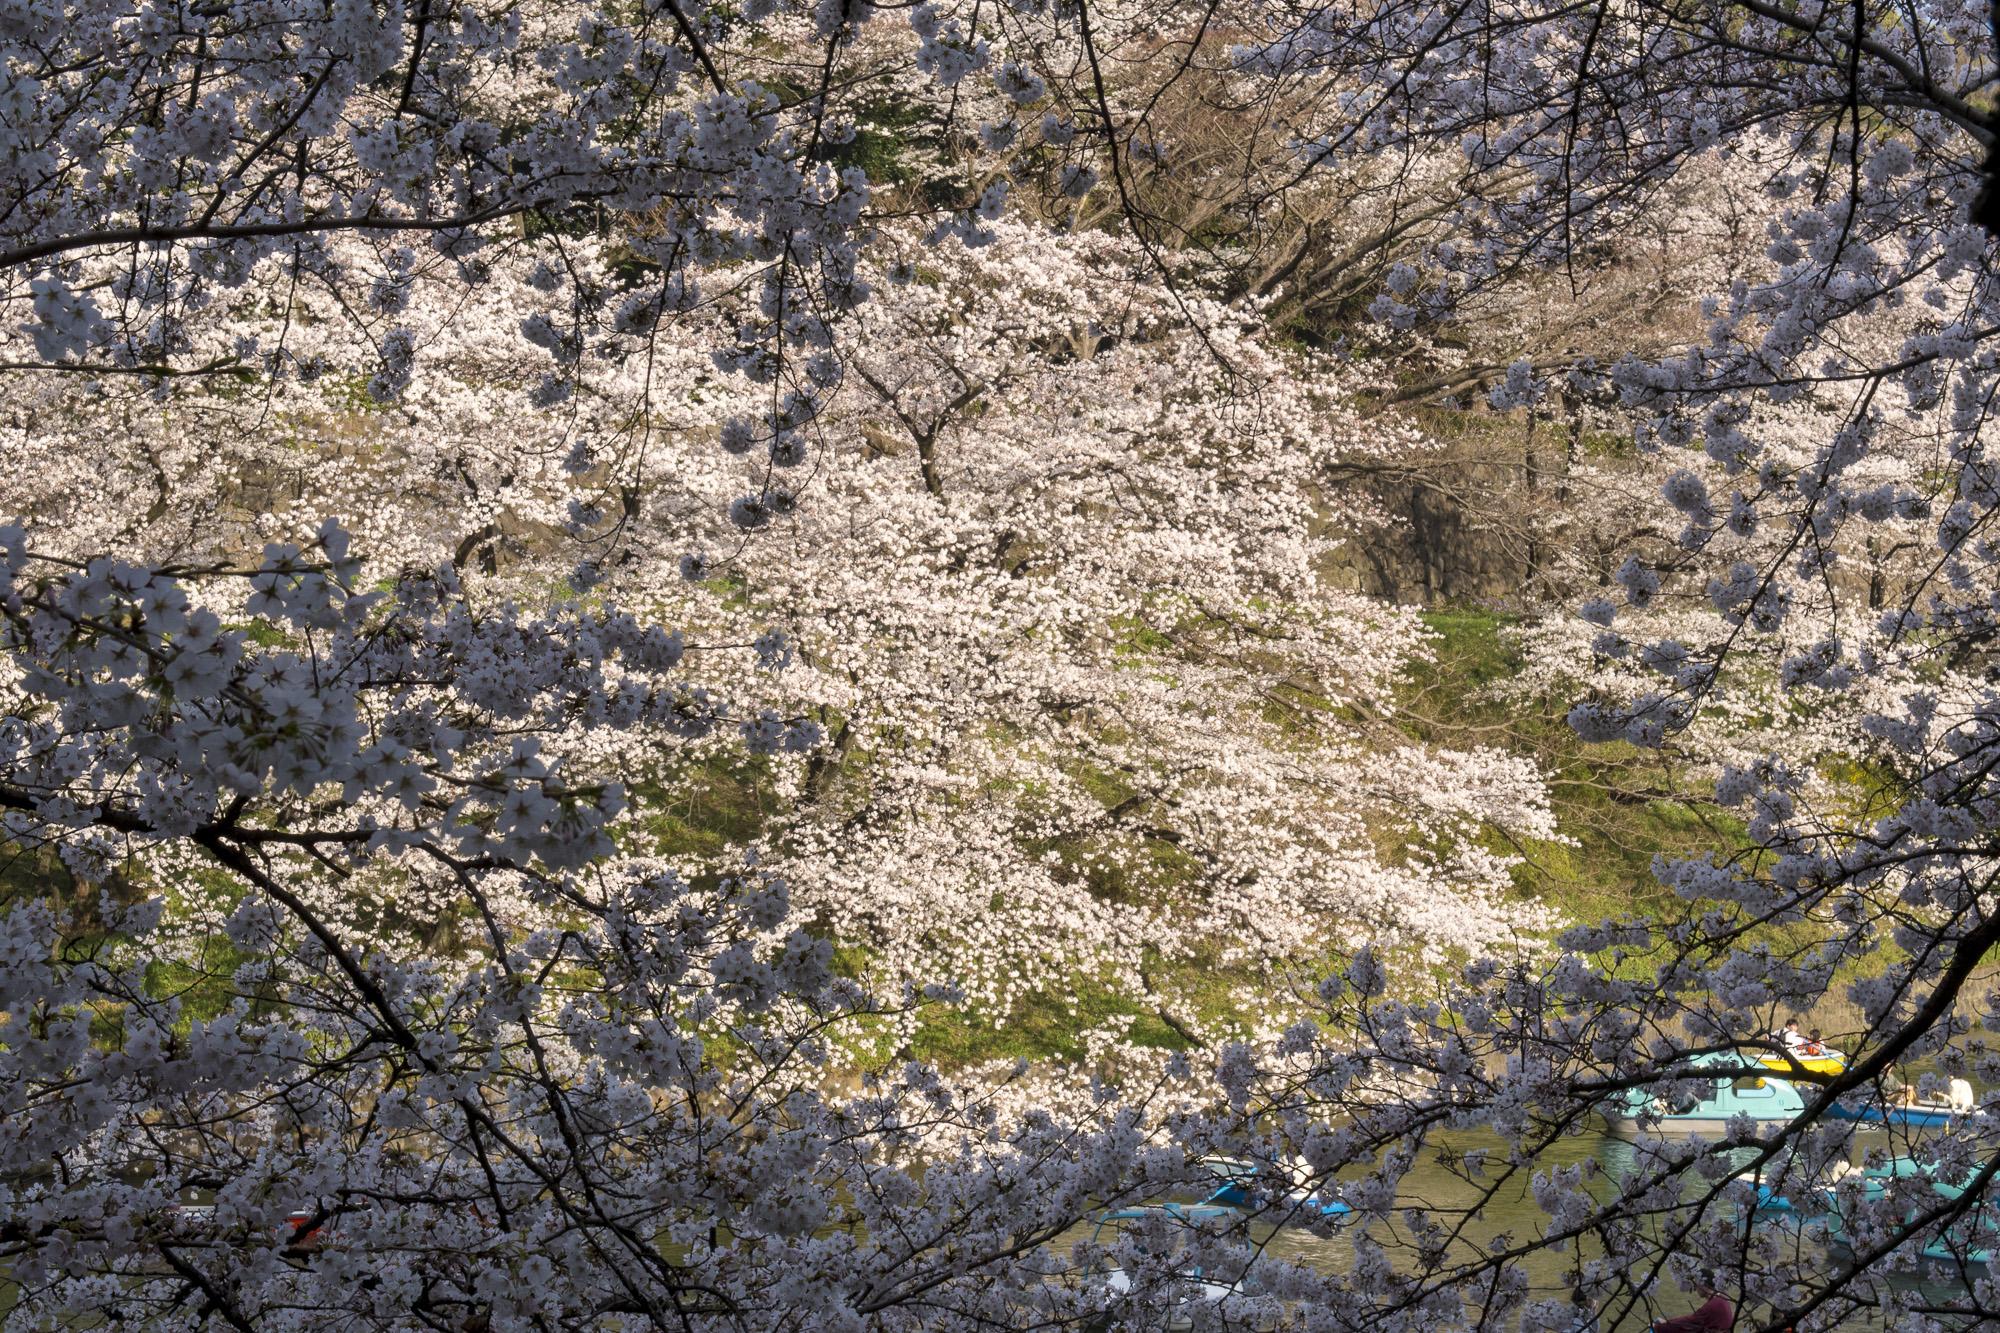 Chidori-ga-fuchi, Tokyo  PHOTOGRAPHY: Alexander J.E. Bradley • NIKON D500 • AF-S NIKKOR 24-70MM ƒ/2.8G ED @ 42MM • ƒ/16 • 1/125 • ISO 400